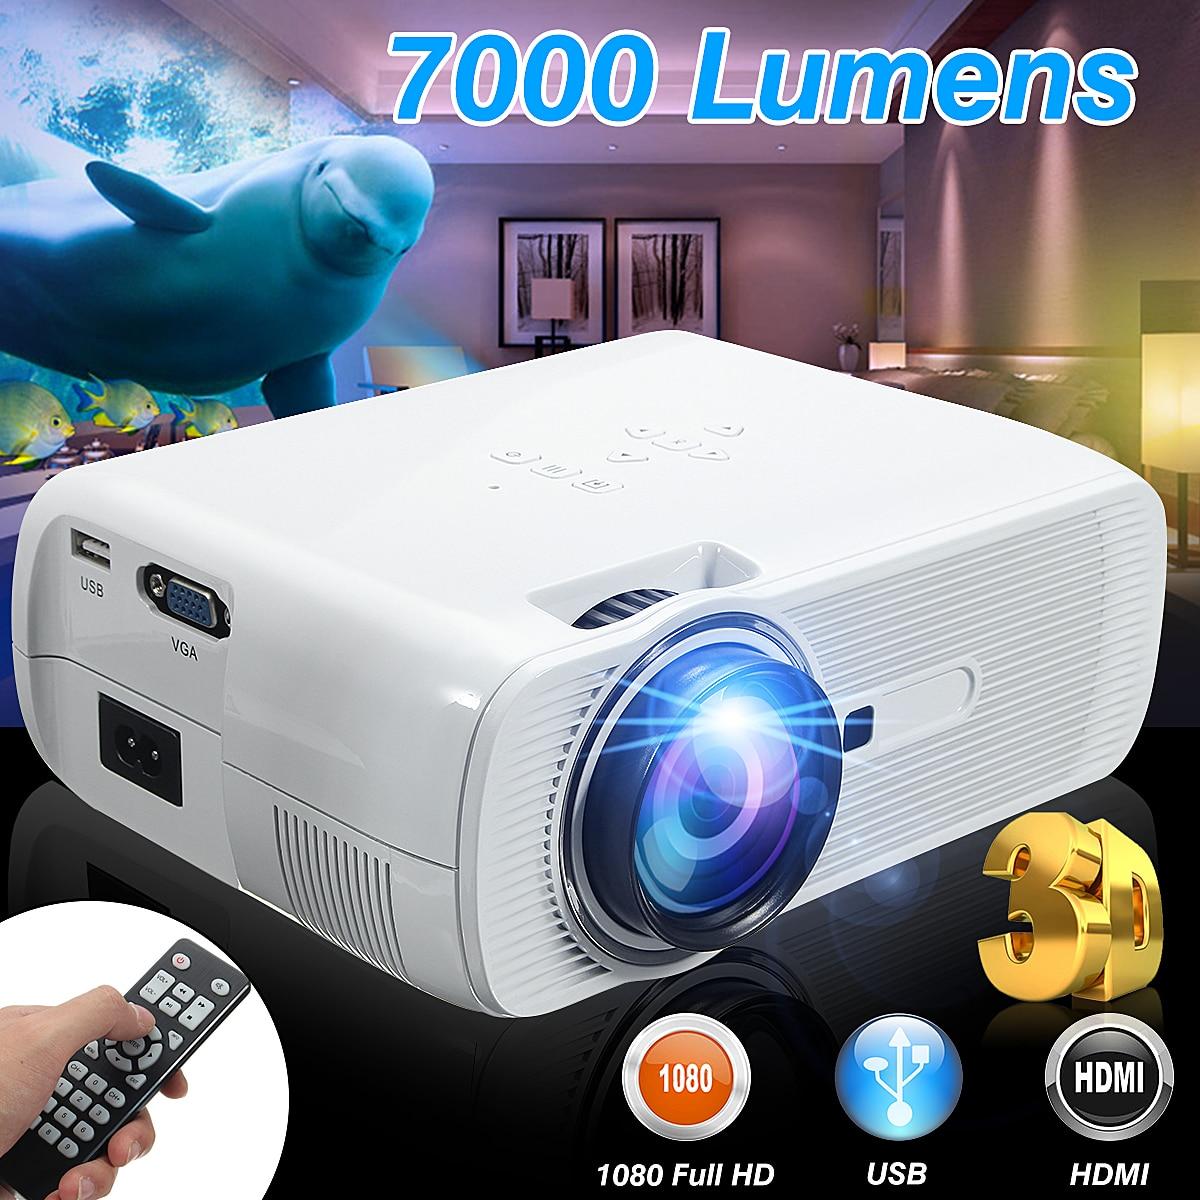 7000 Lumens HD LED Projector 3D Large Screen Home Theater Cinema LCD Wireless HDMI AV/VGA/USB/SD/HDMI/TV Multimedia Beamer